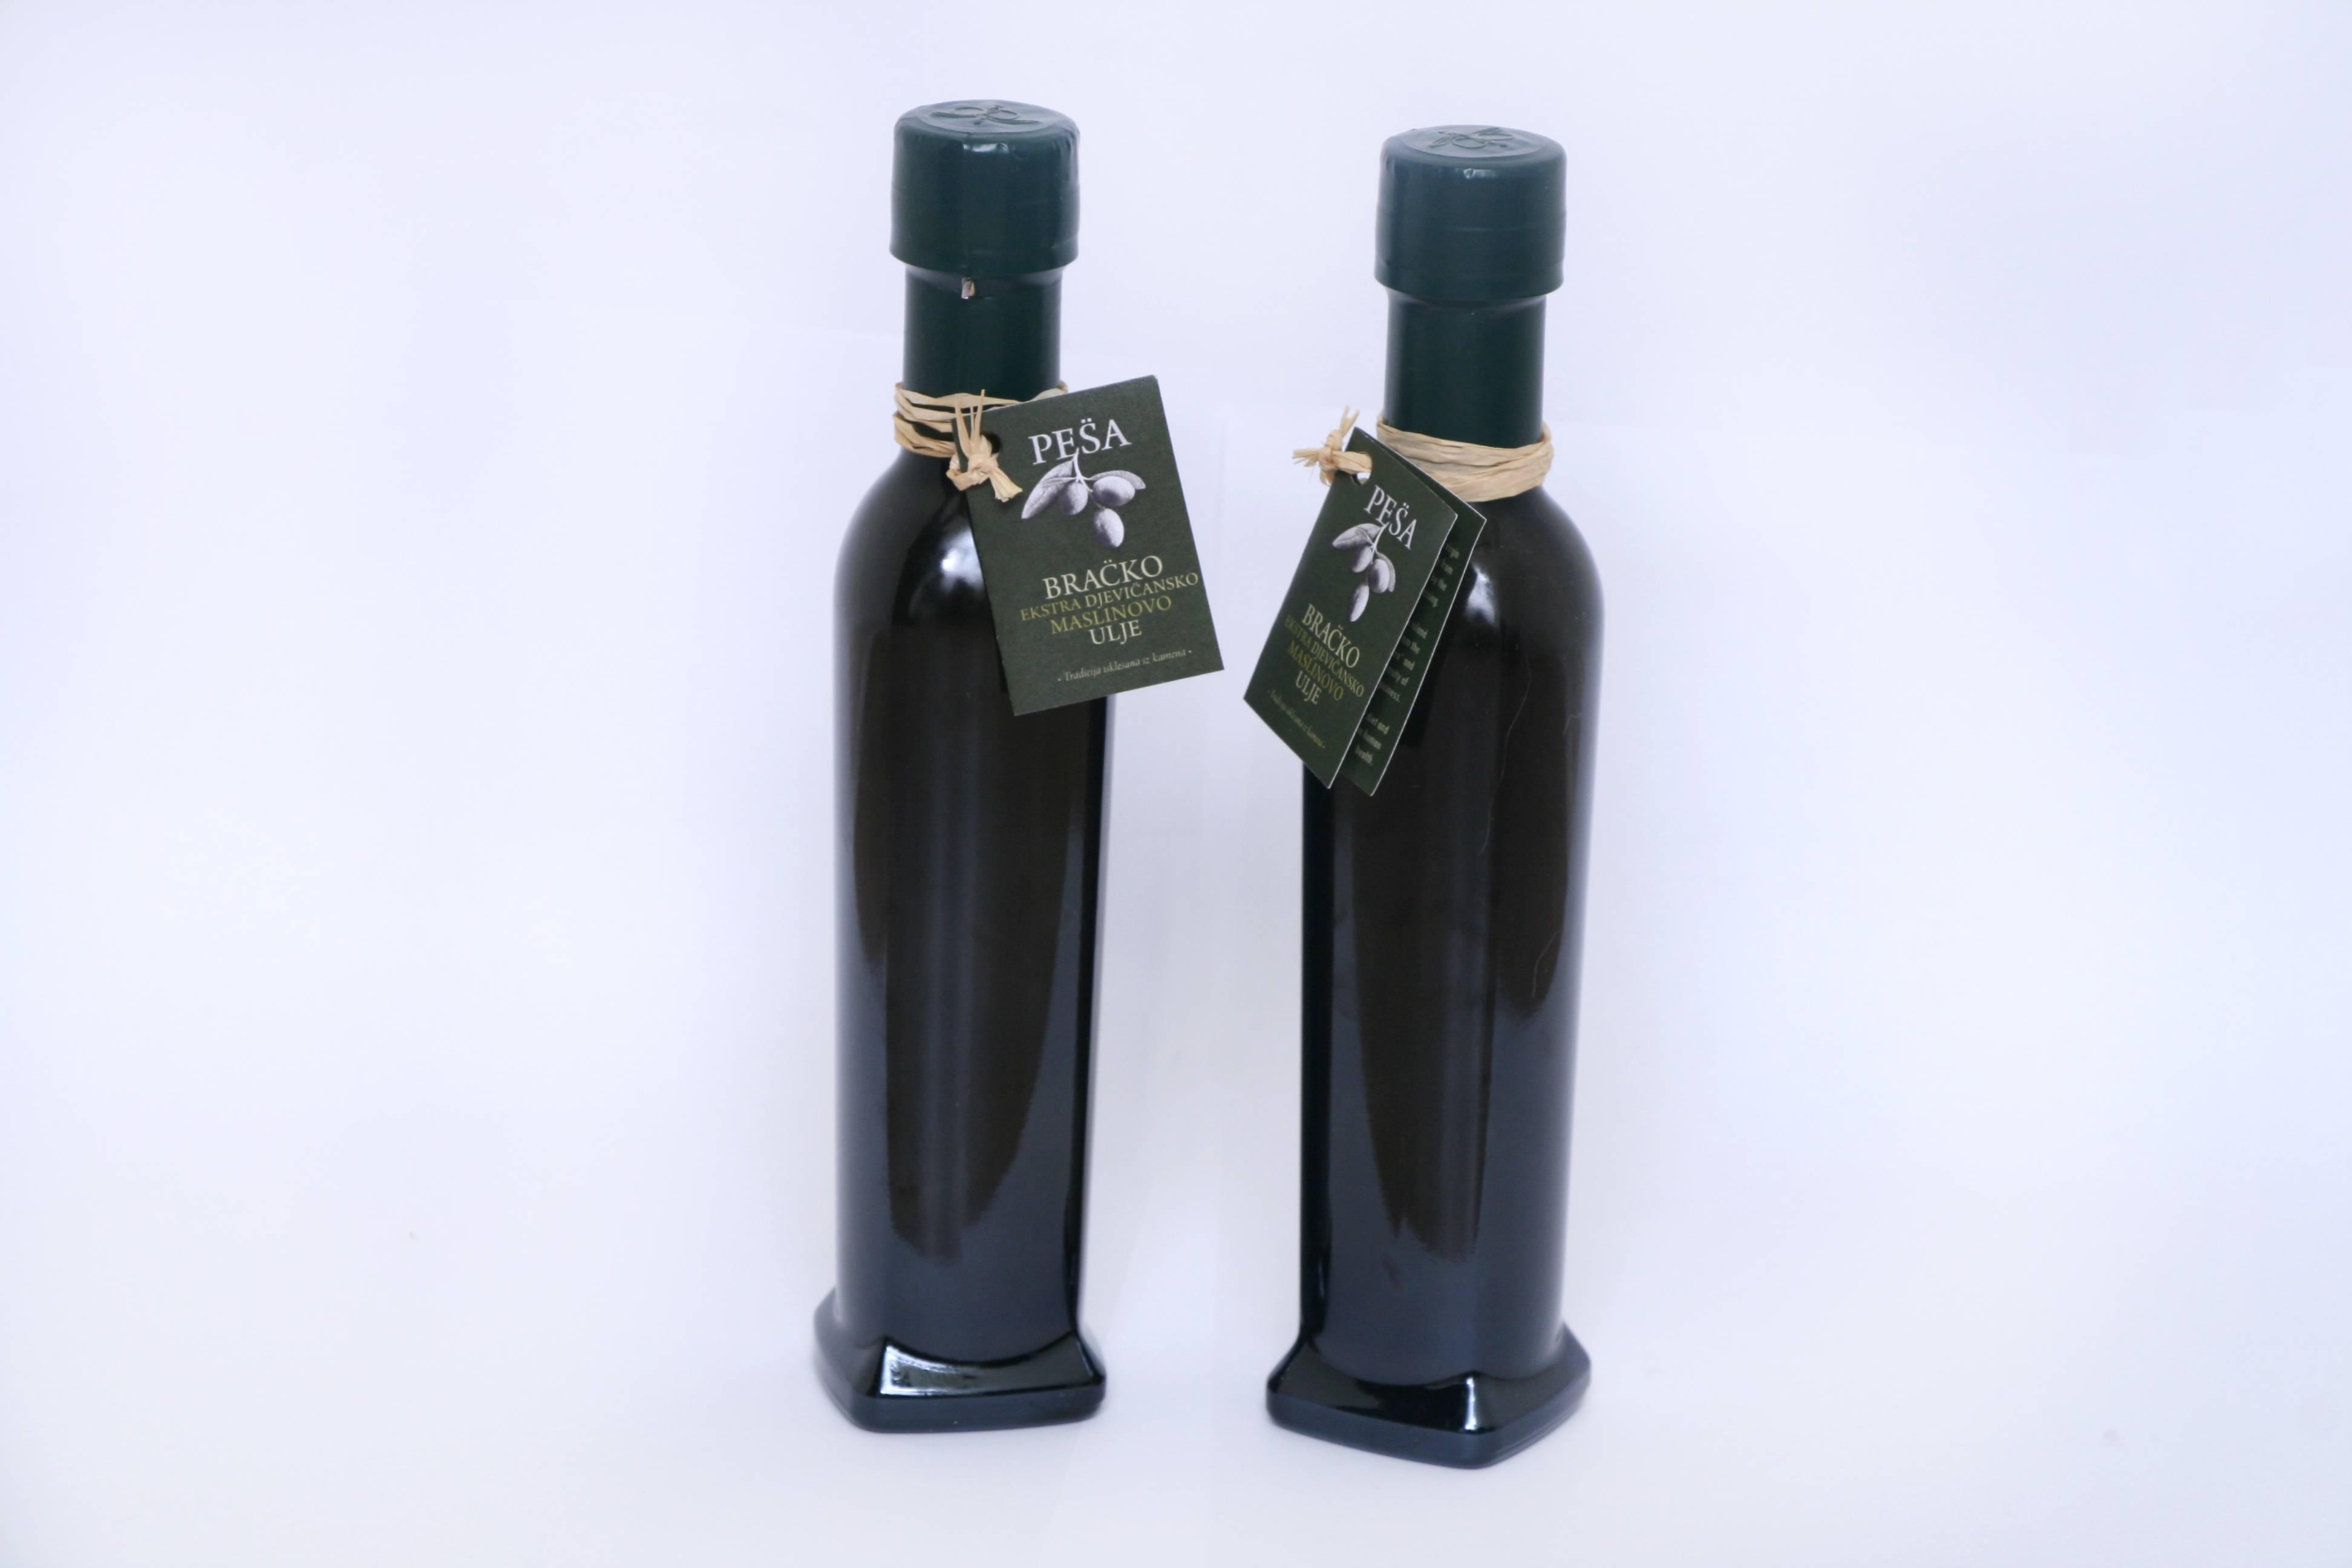 Bračko ekstra djevičansko maslinovo ulje 0.25 l